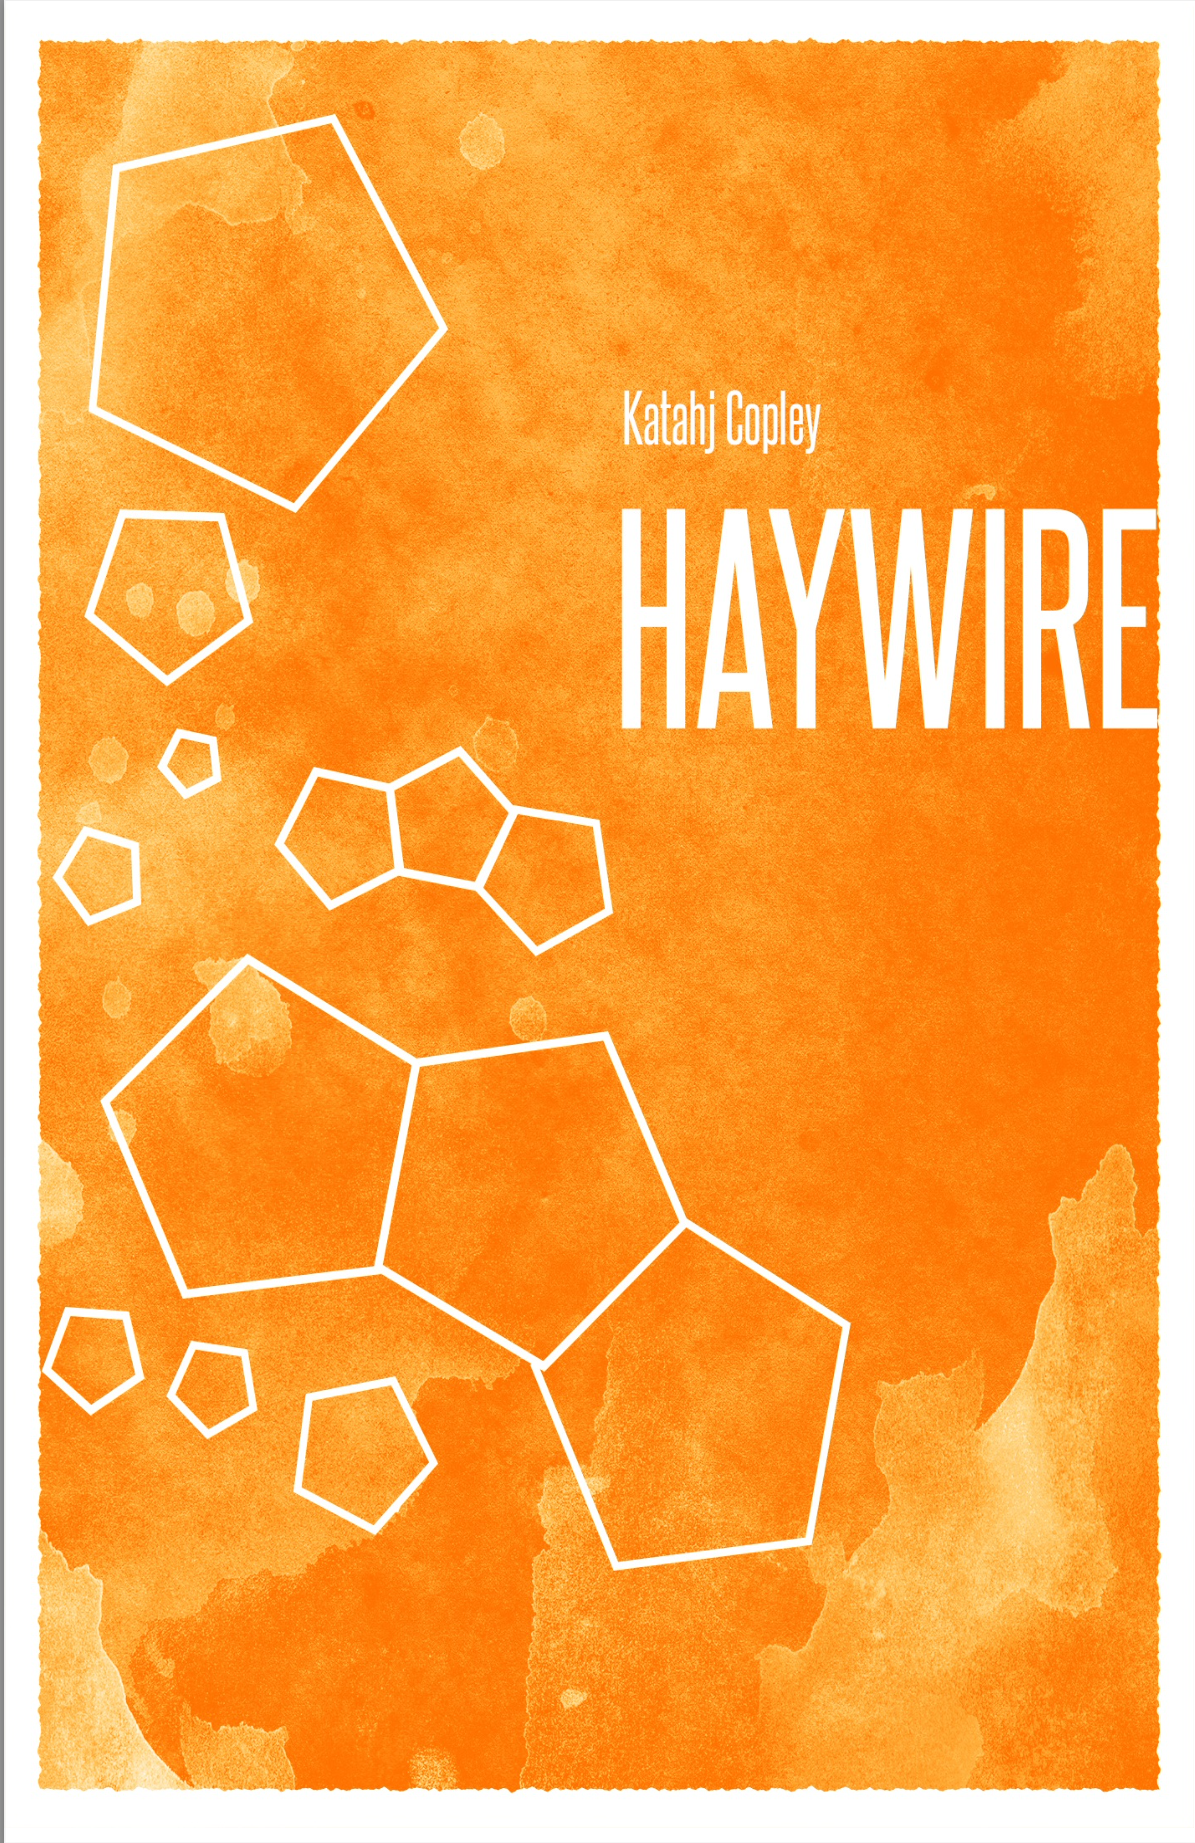 Haywire by Katahj Copley